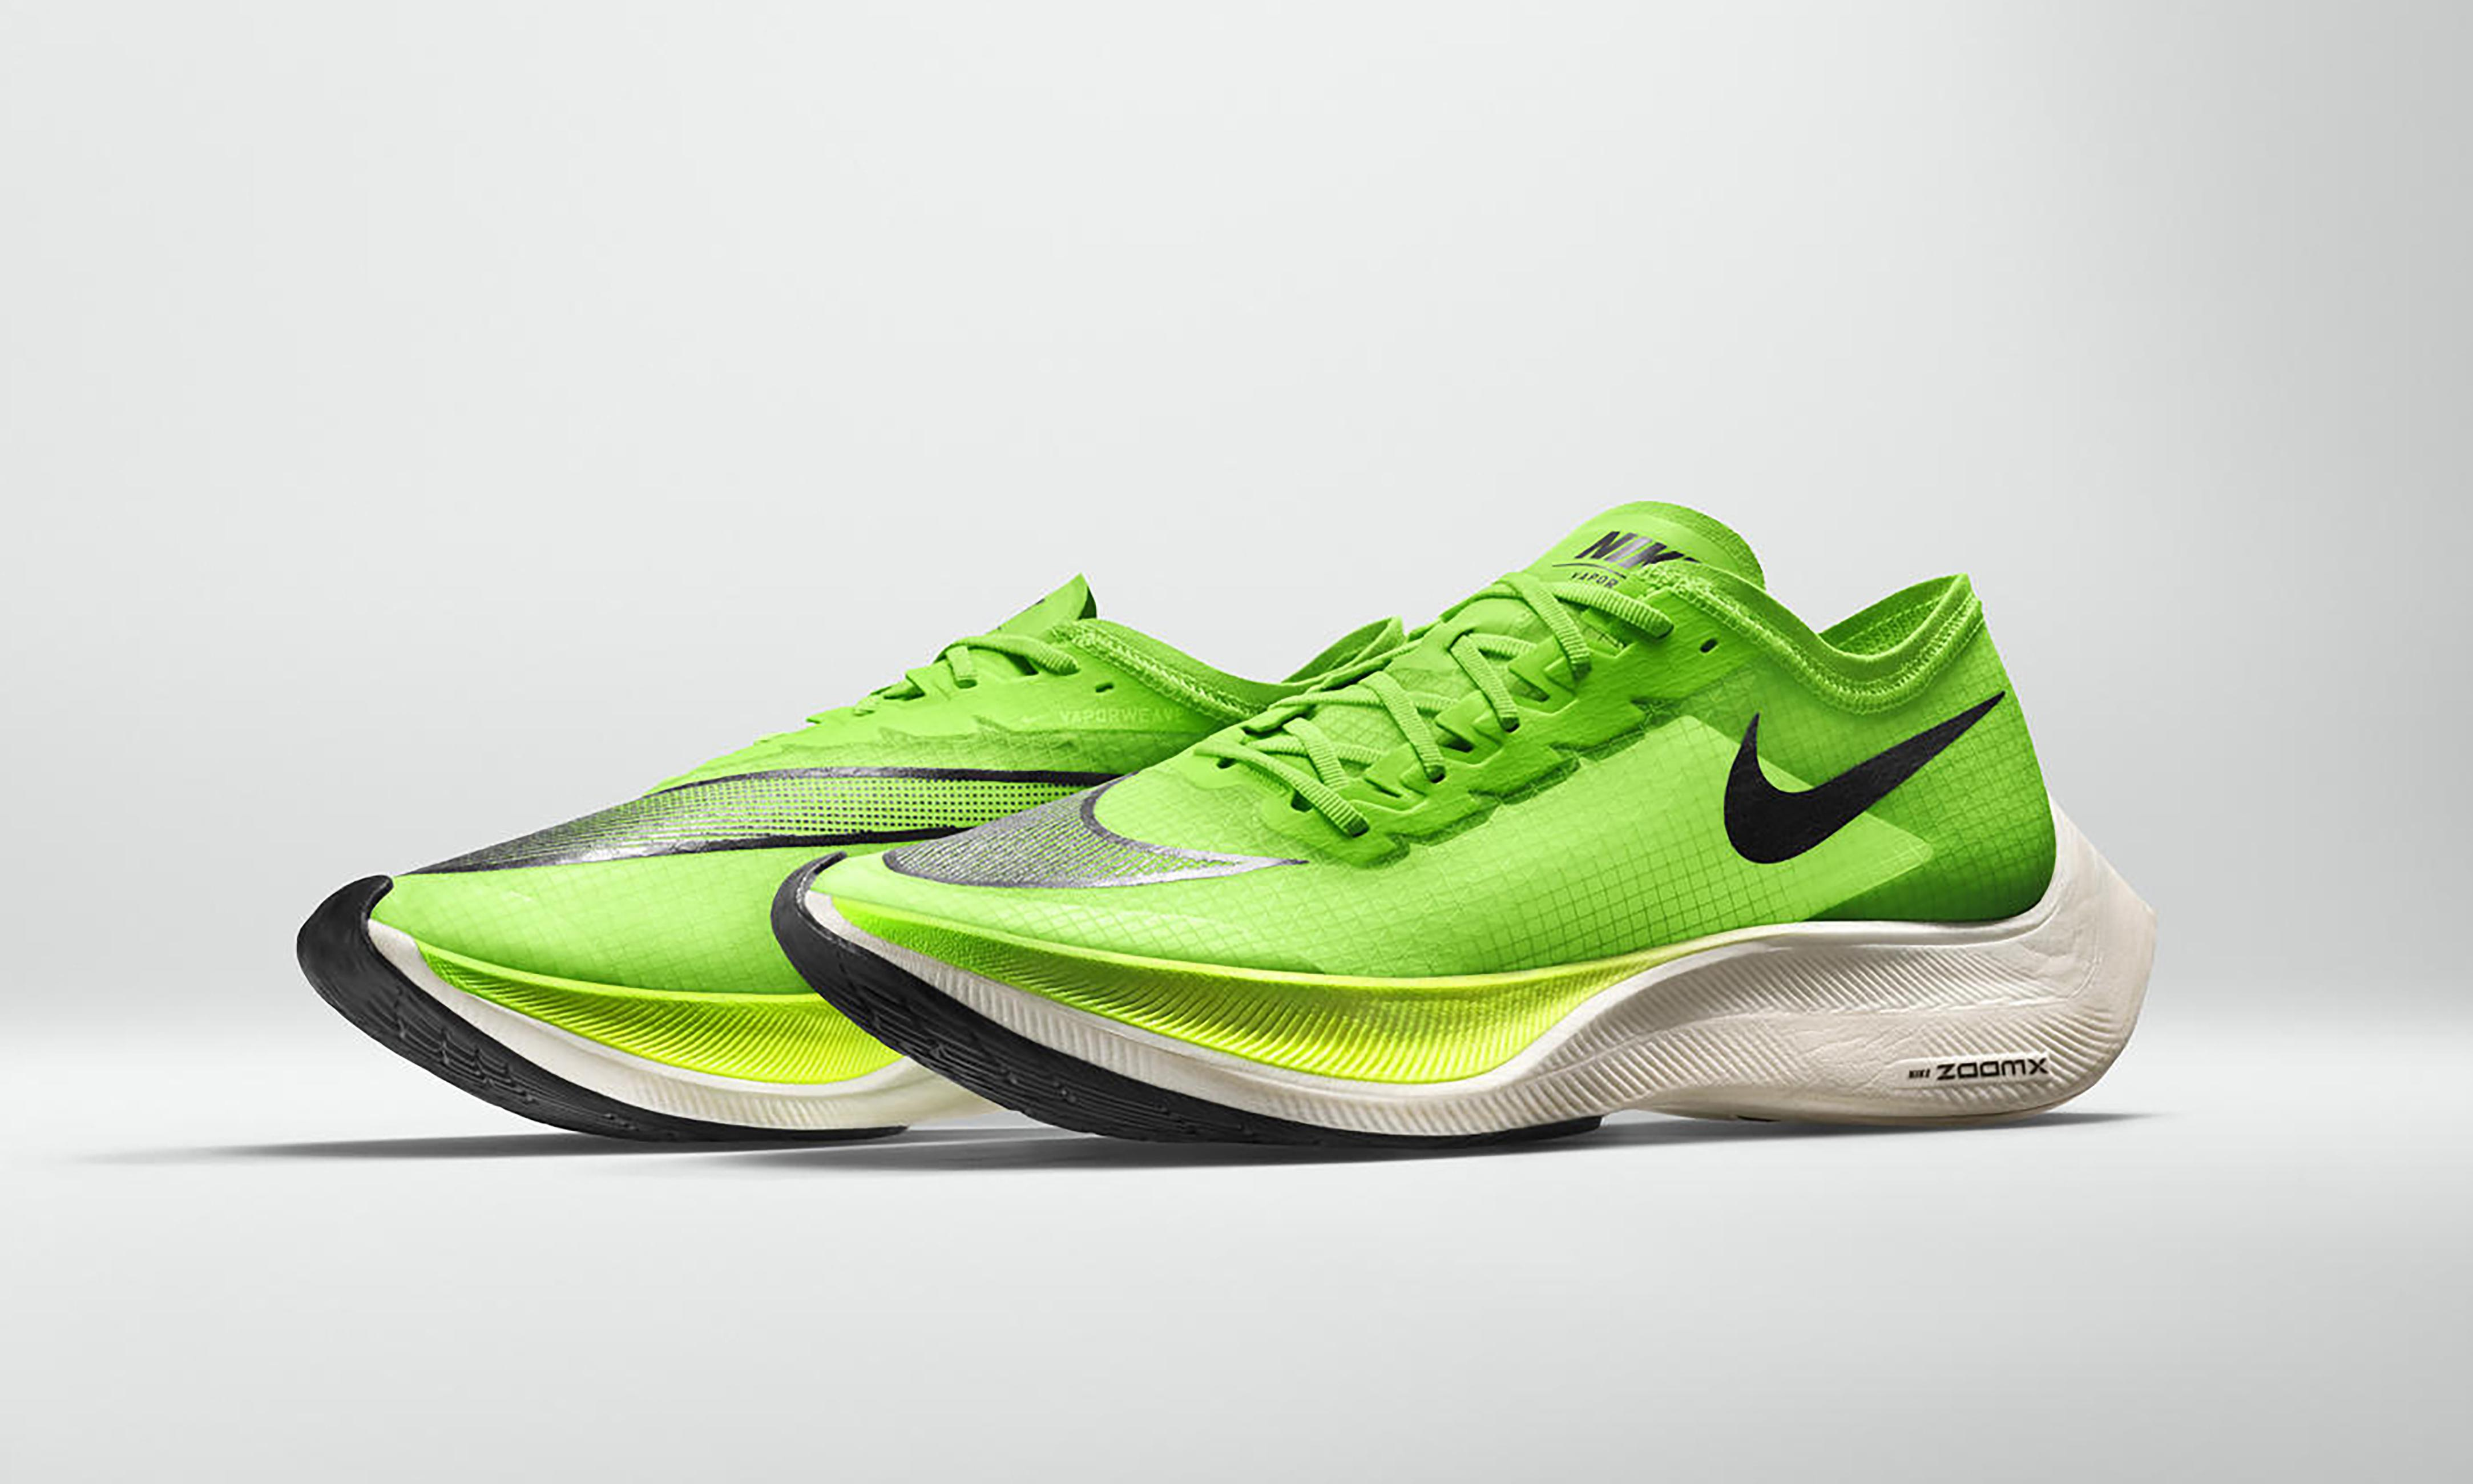 Vaporfly shoes will help me reach my marathon dream. Should I use them?